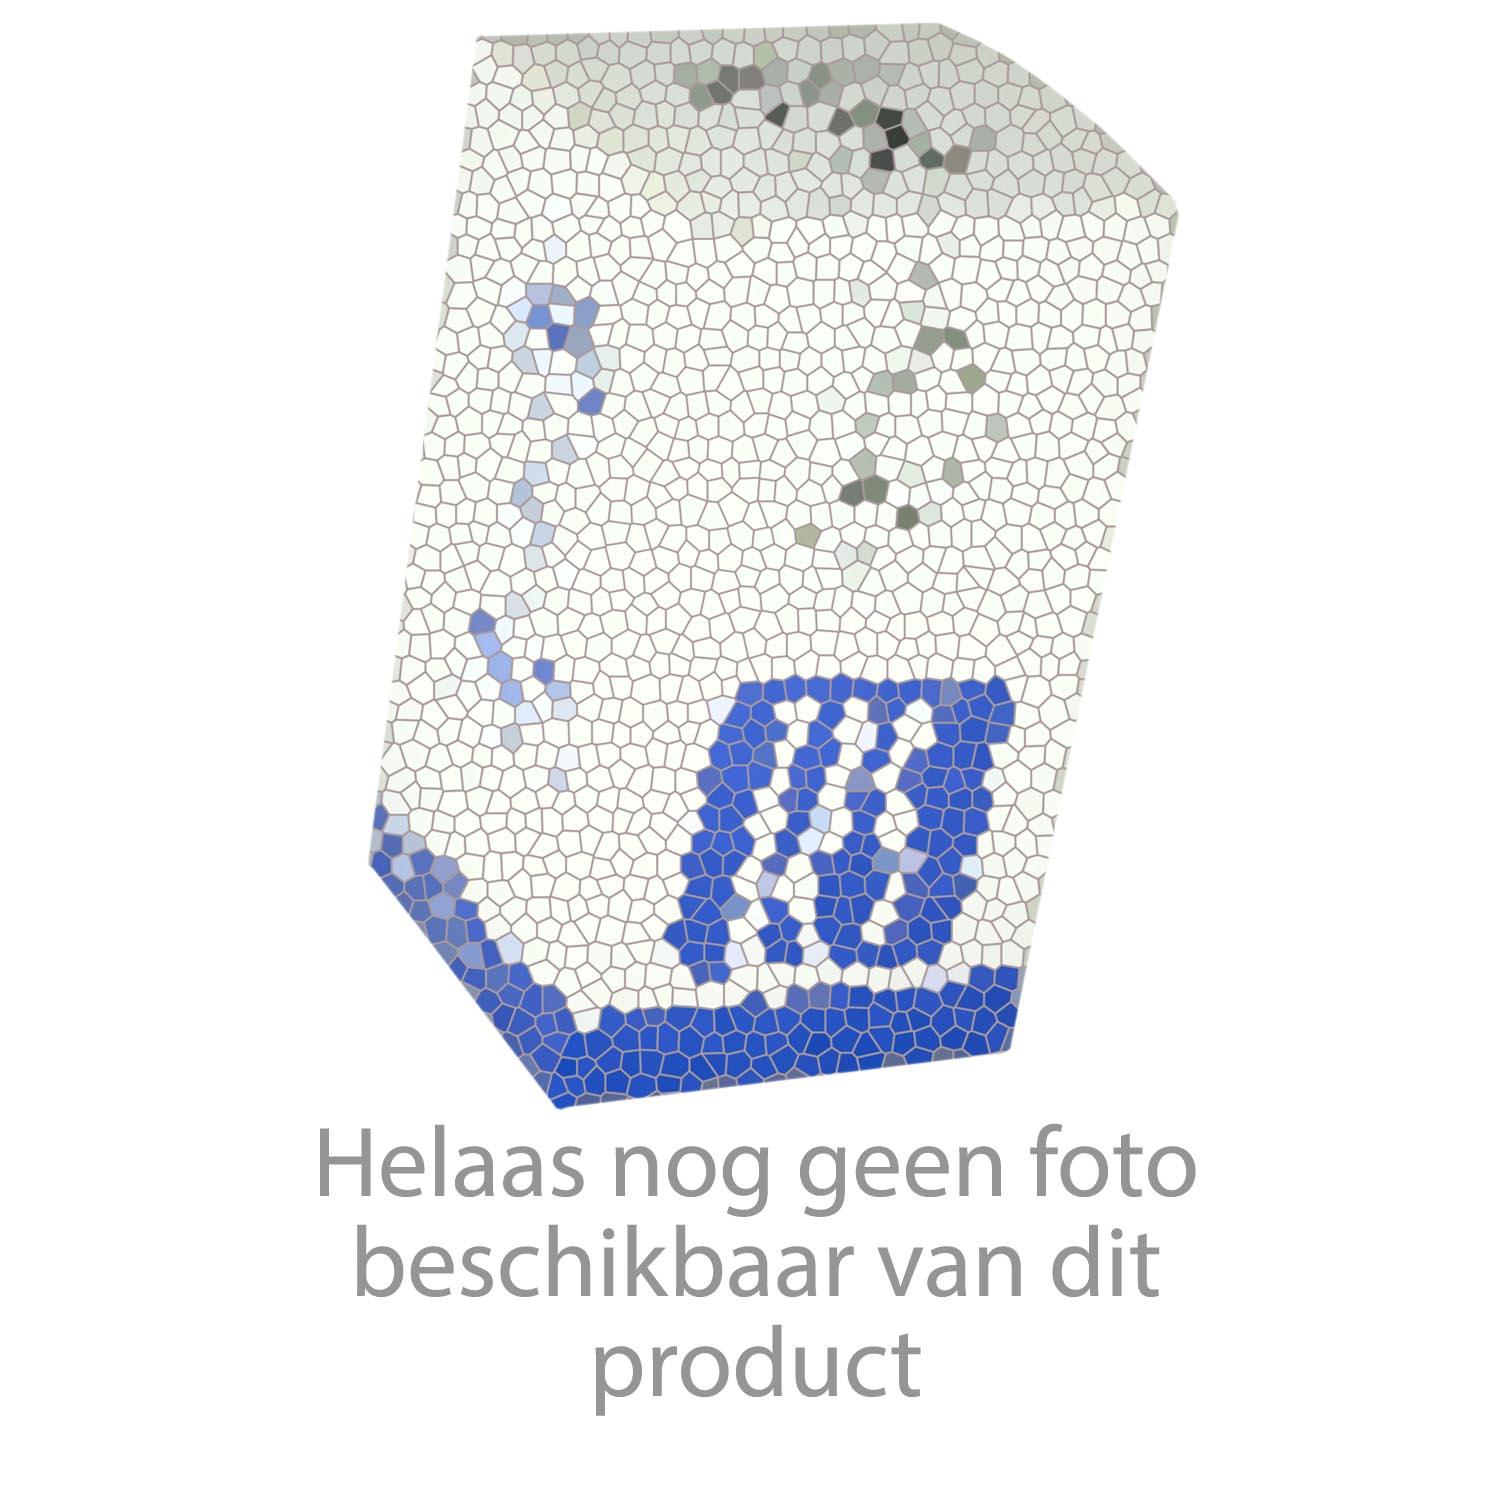 Echtermann Keramisch bovendeel 3/4 R90gr. S=25mm met greep ( blauw ) Artikel nummer 2144.30/6.1.3